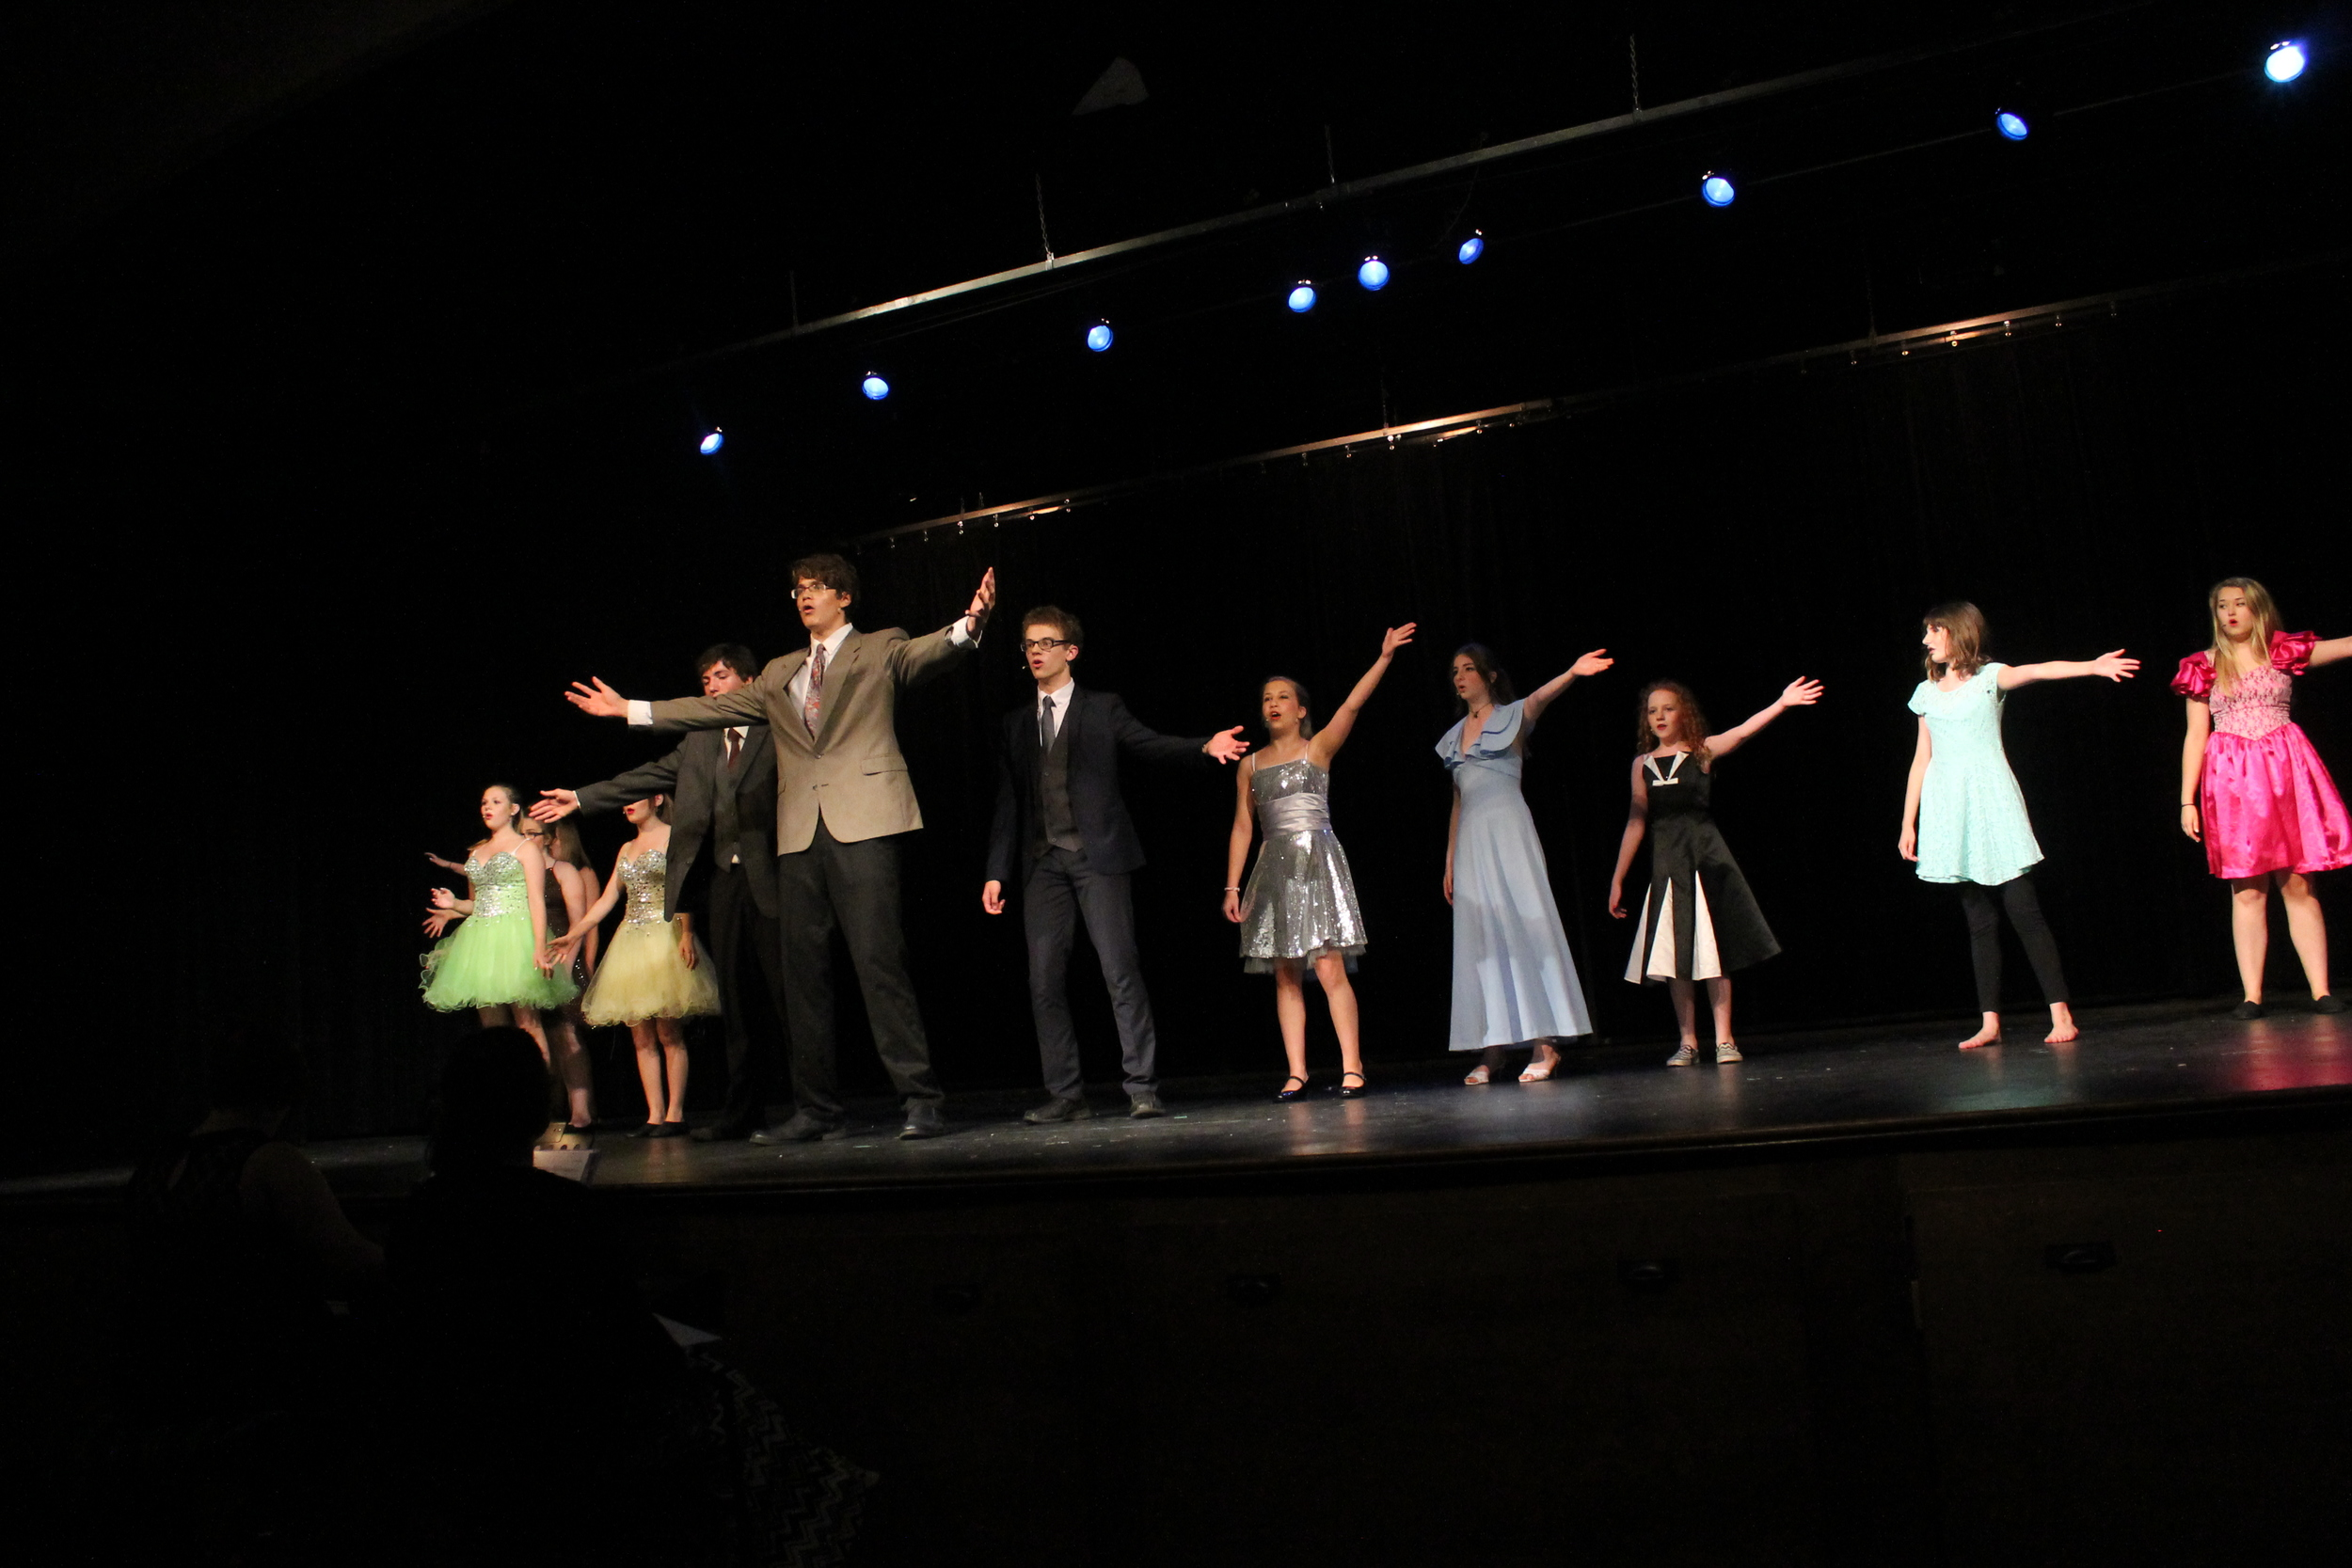 Musical Theatre Camp Performance, 2016 Photo Credit: Keshia Laffin